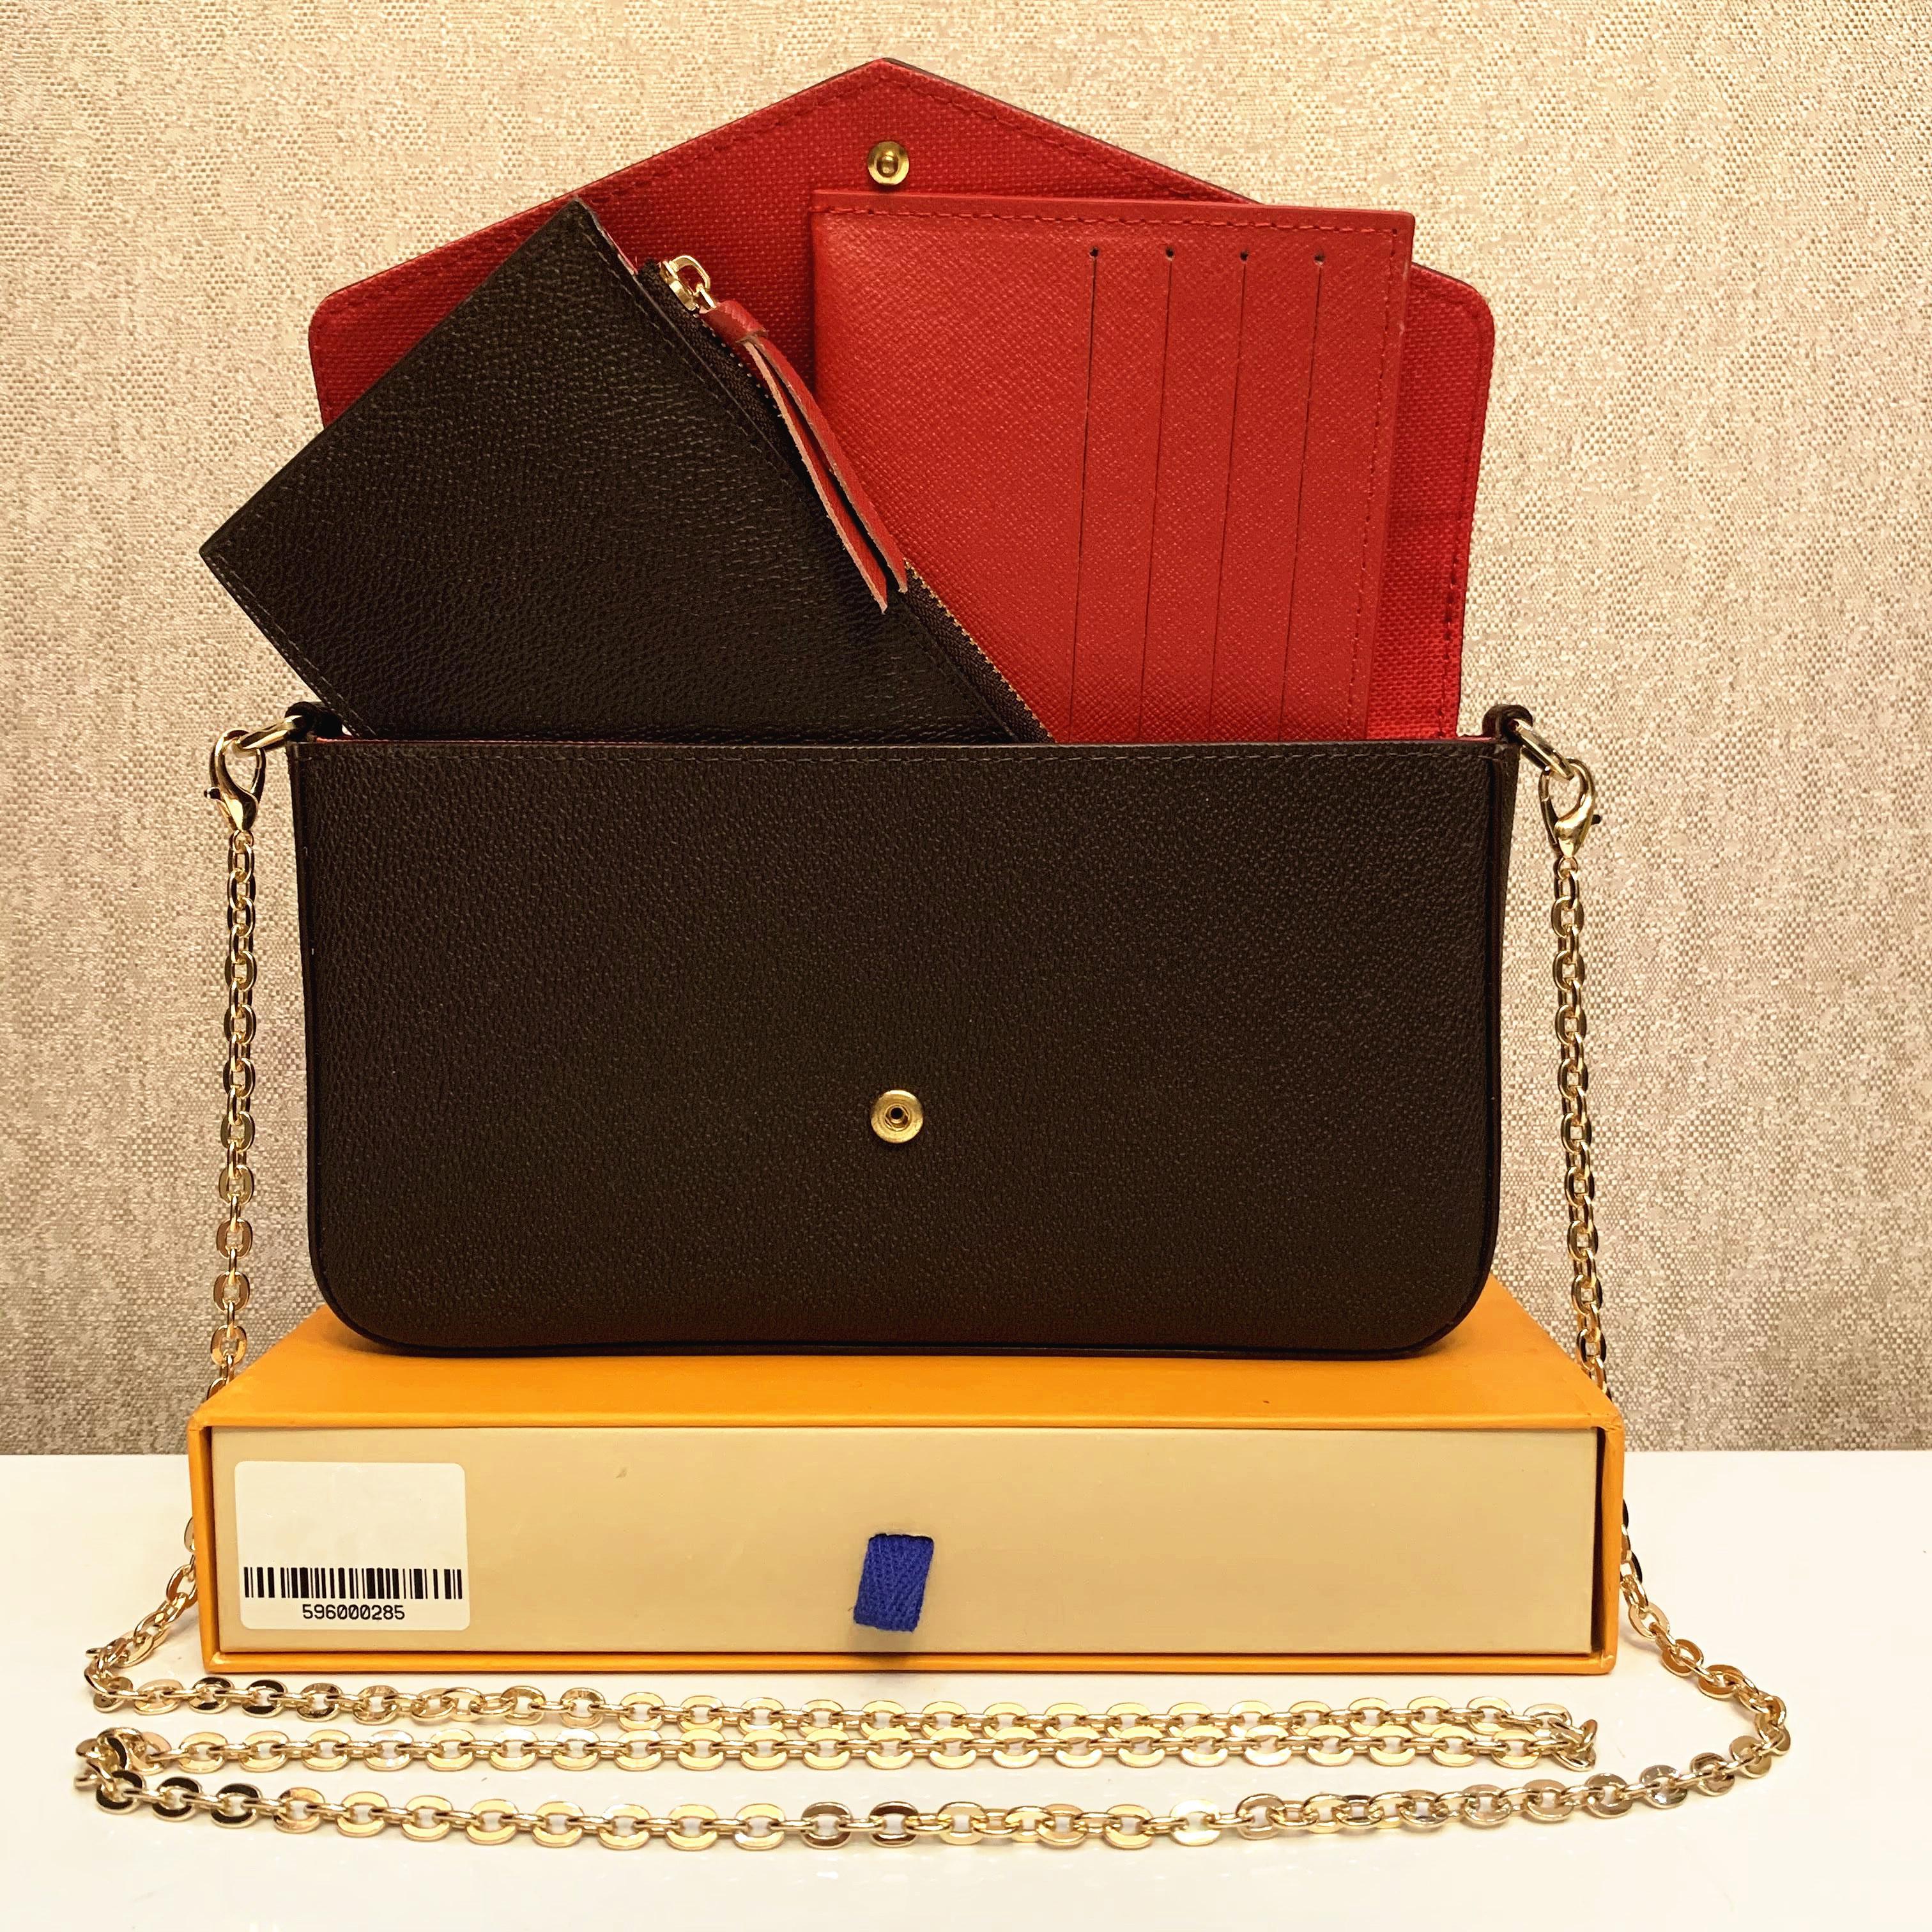 Designer Designer Designer Designer Fashion Crossbody Bags Borsa da portafoglio Zaino Borse Borse Borse Borse Borse Borse Borse Shoulder Tote Mini Borsa 2021